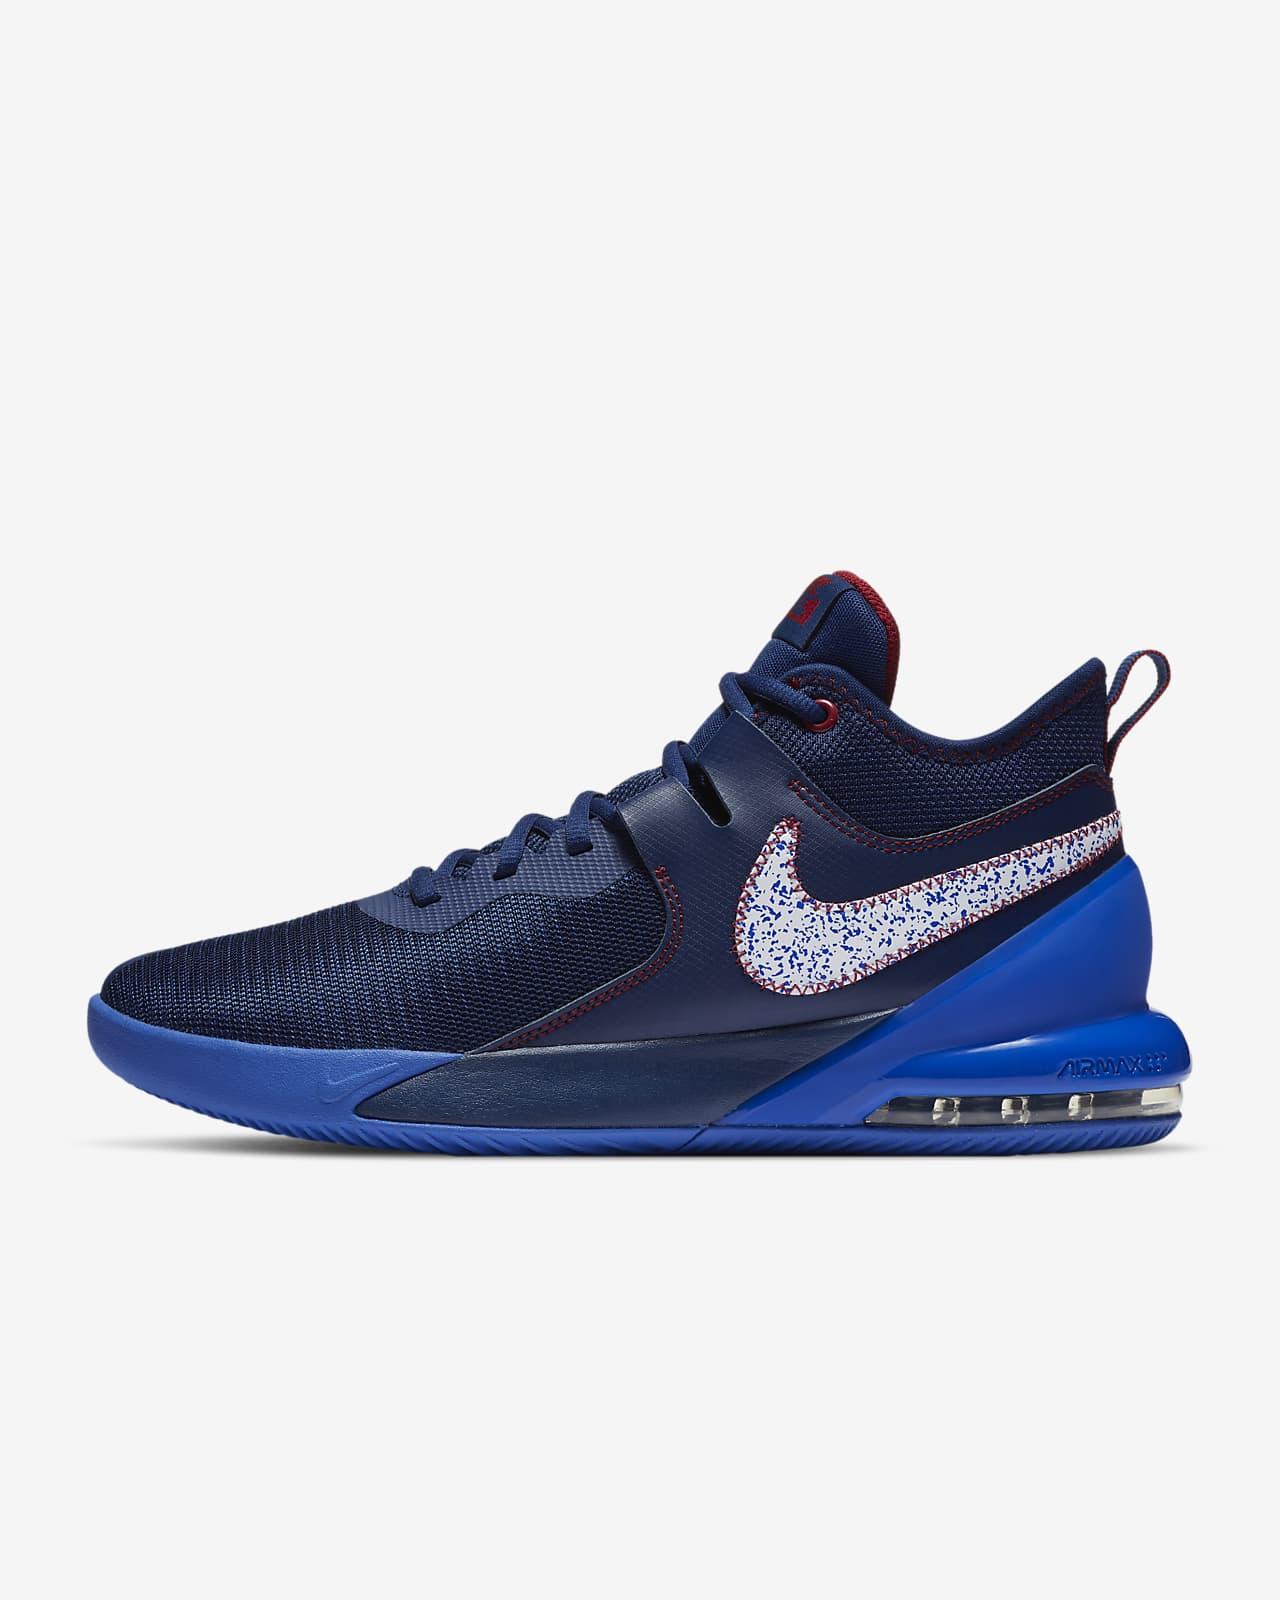 nike air max zapatillas de baloncesto